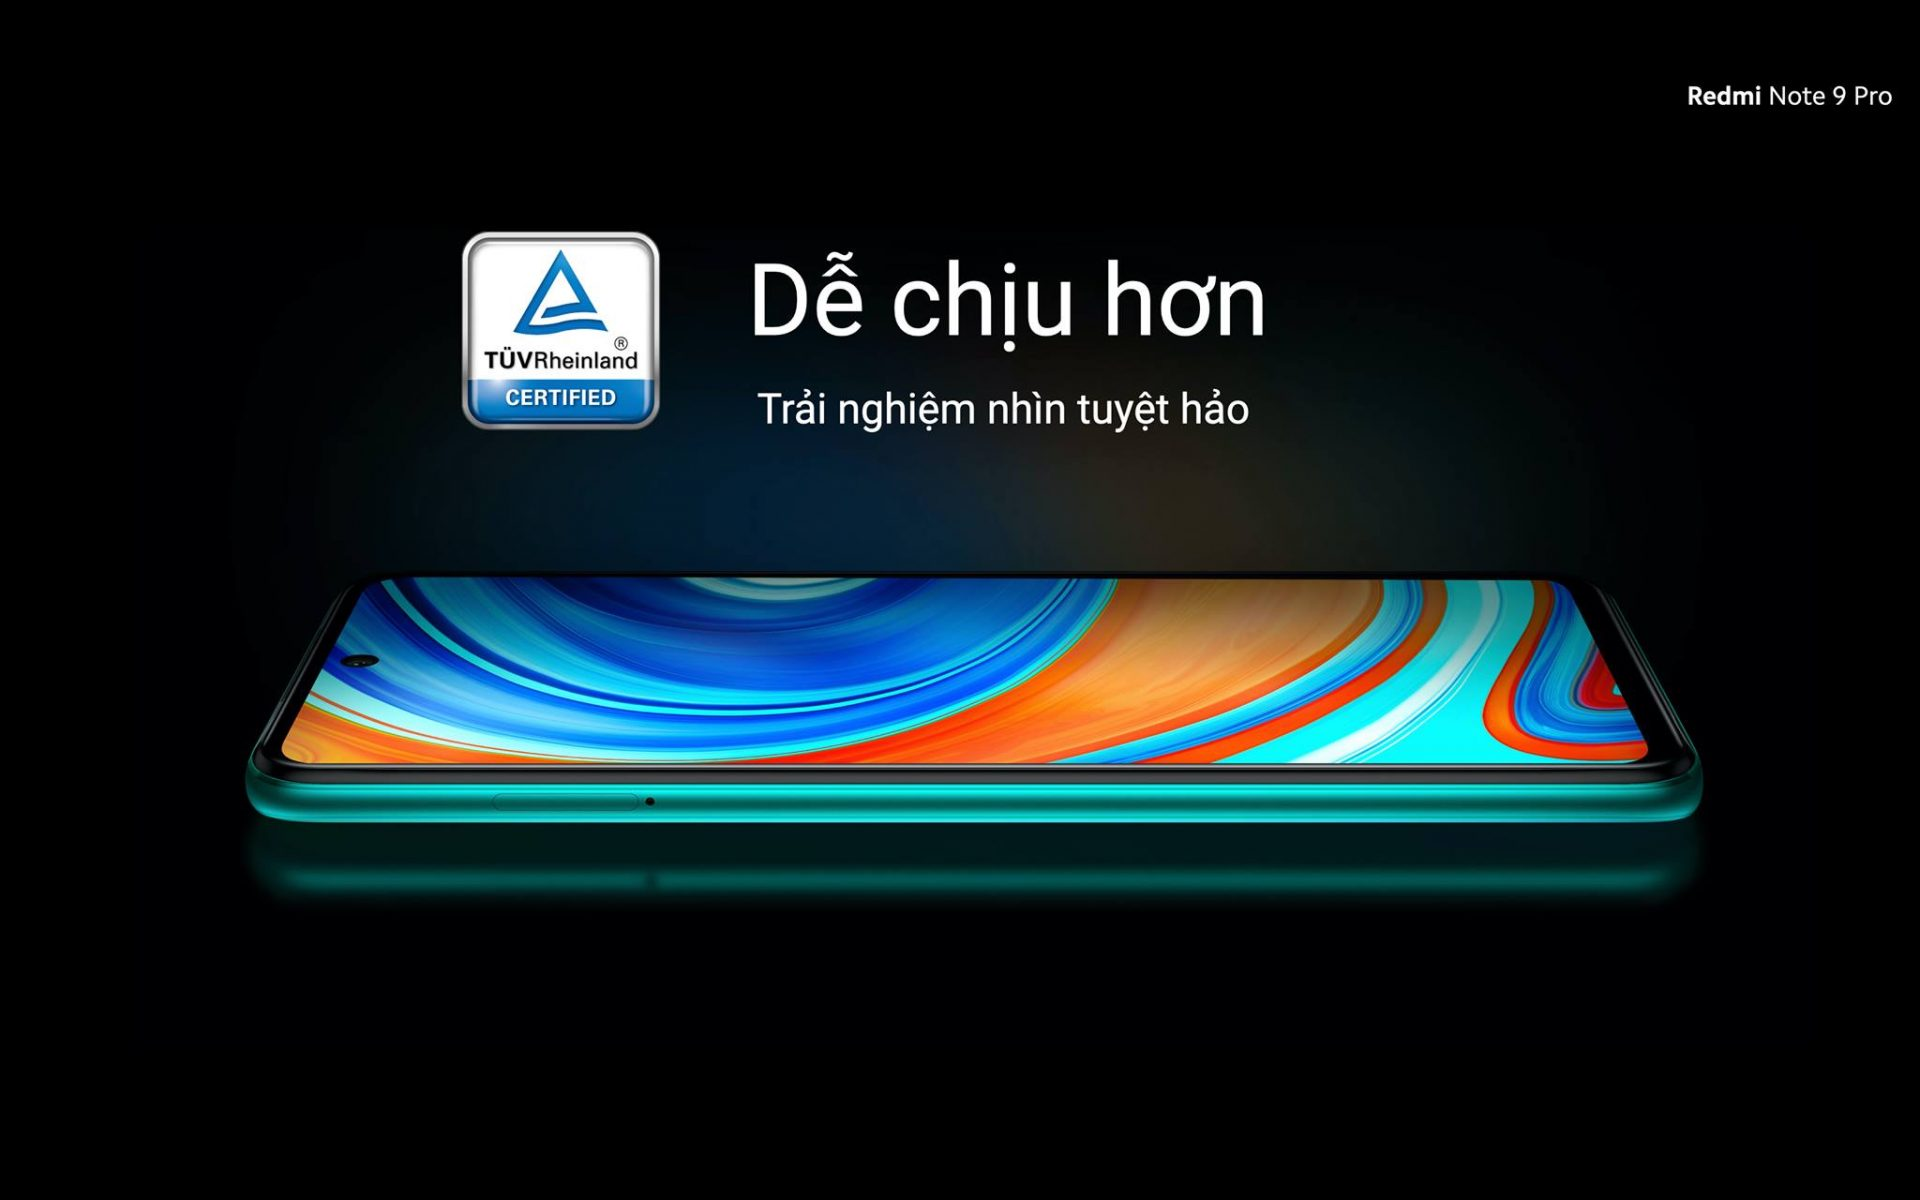 Xiaomi ra mắt bộ đôi Redmi Note 9 và Redmi Note 9 Pro - 14